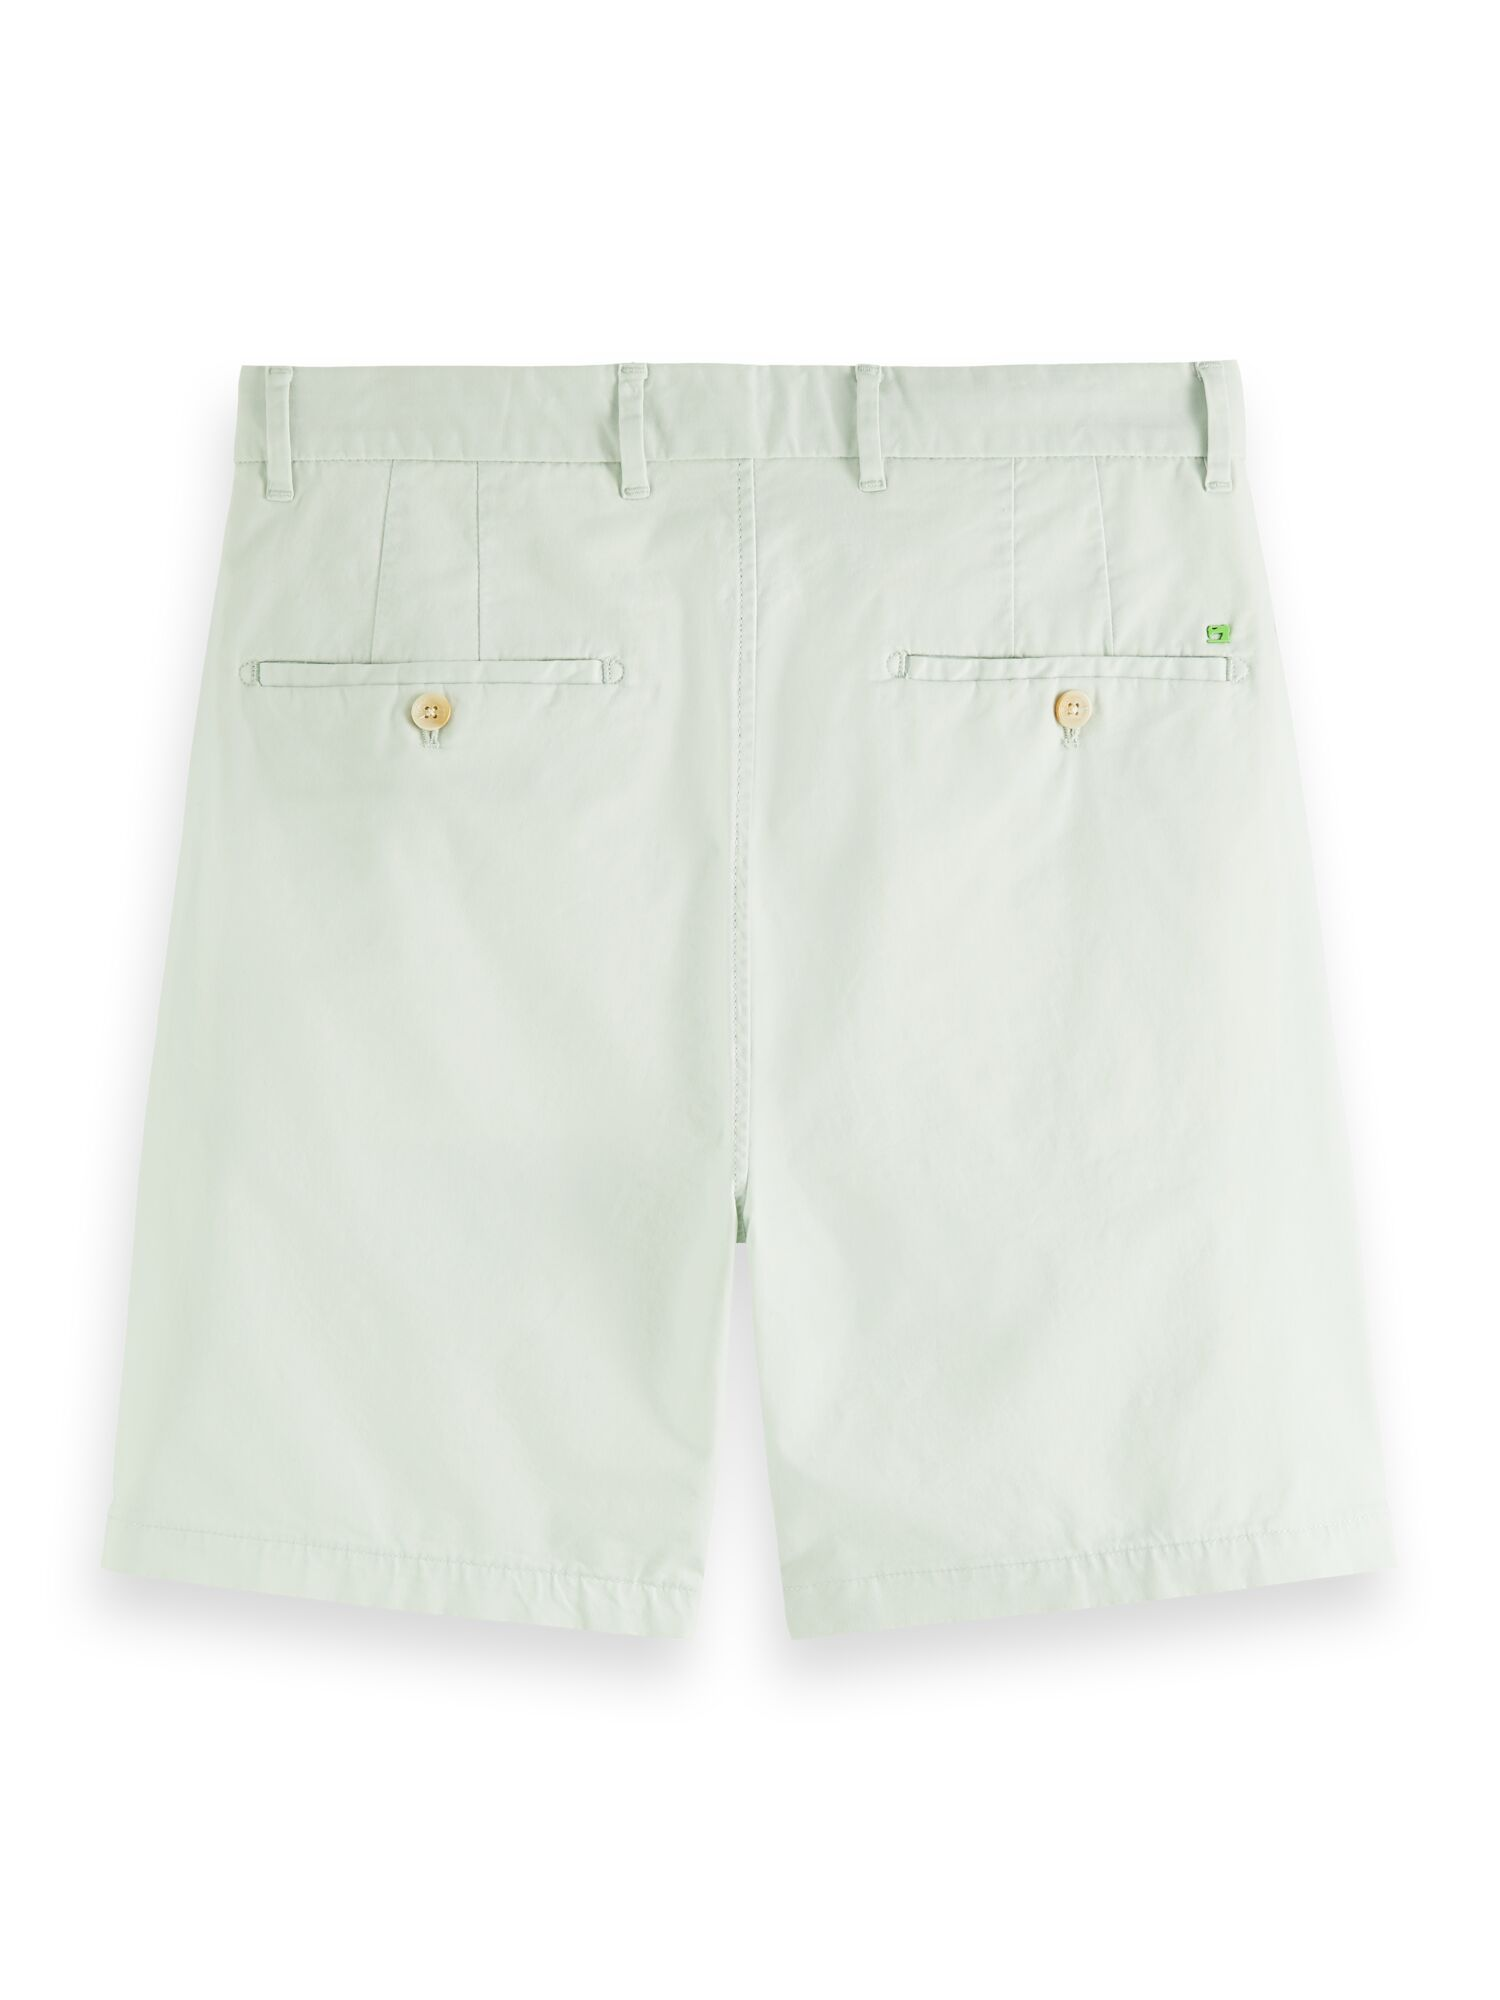 Scotch & Soda | STUART- Classic pima cotton short